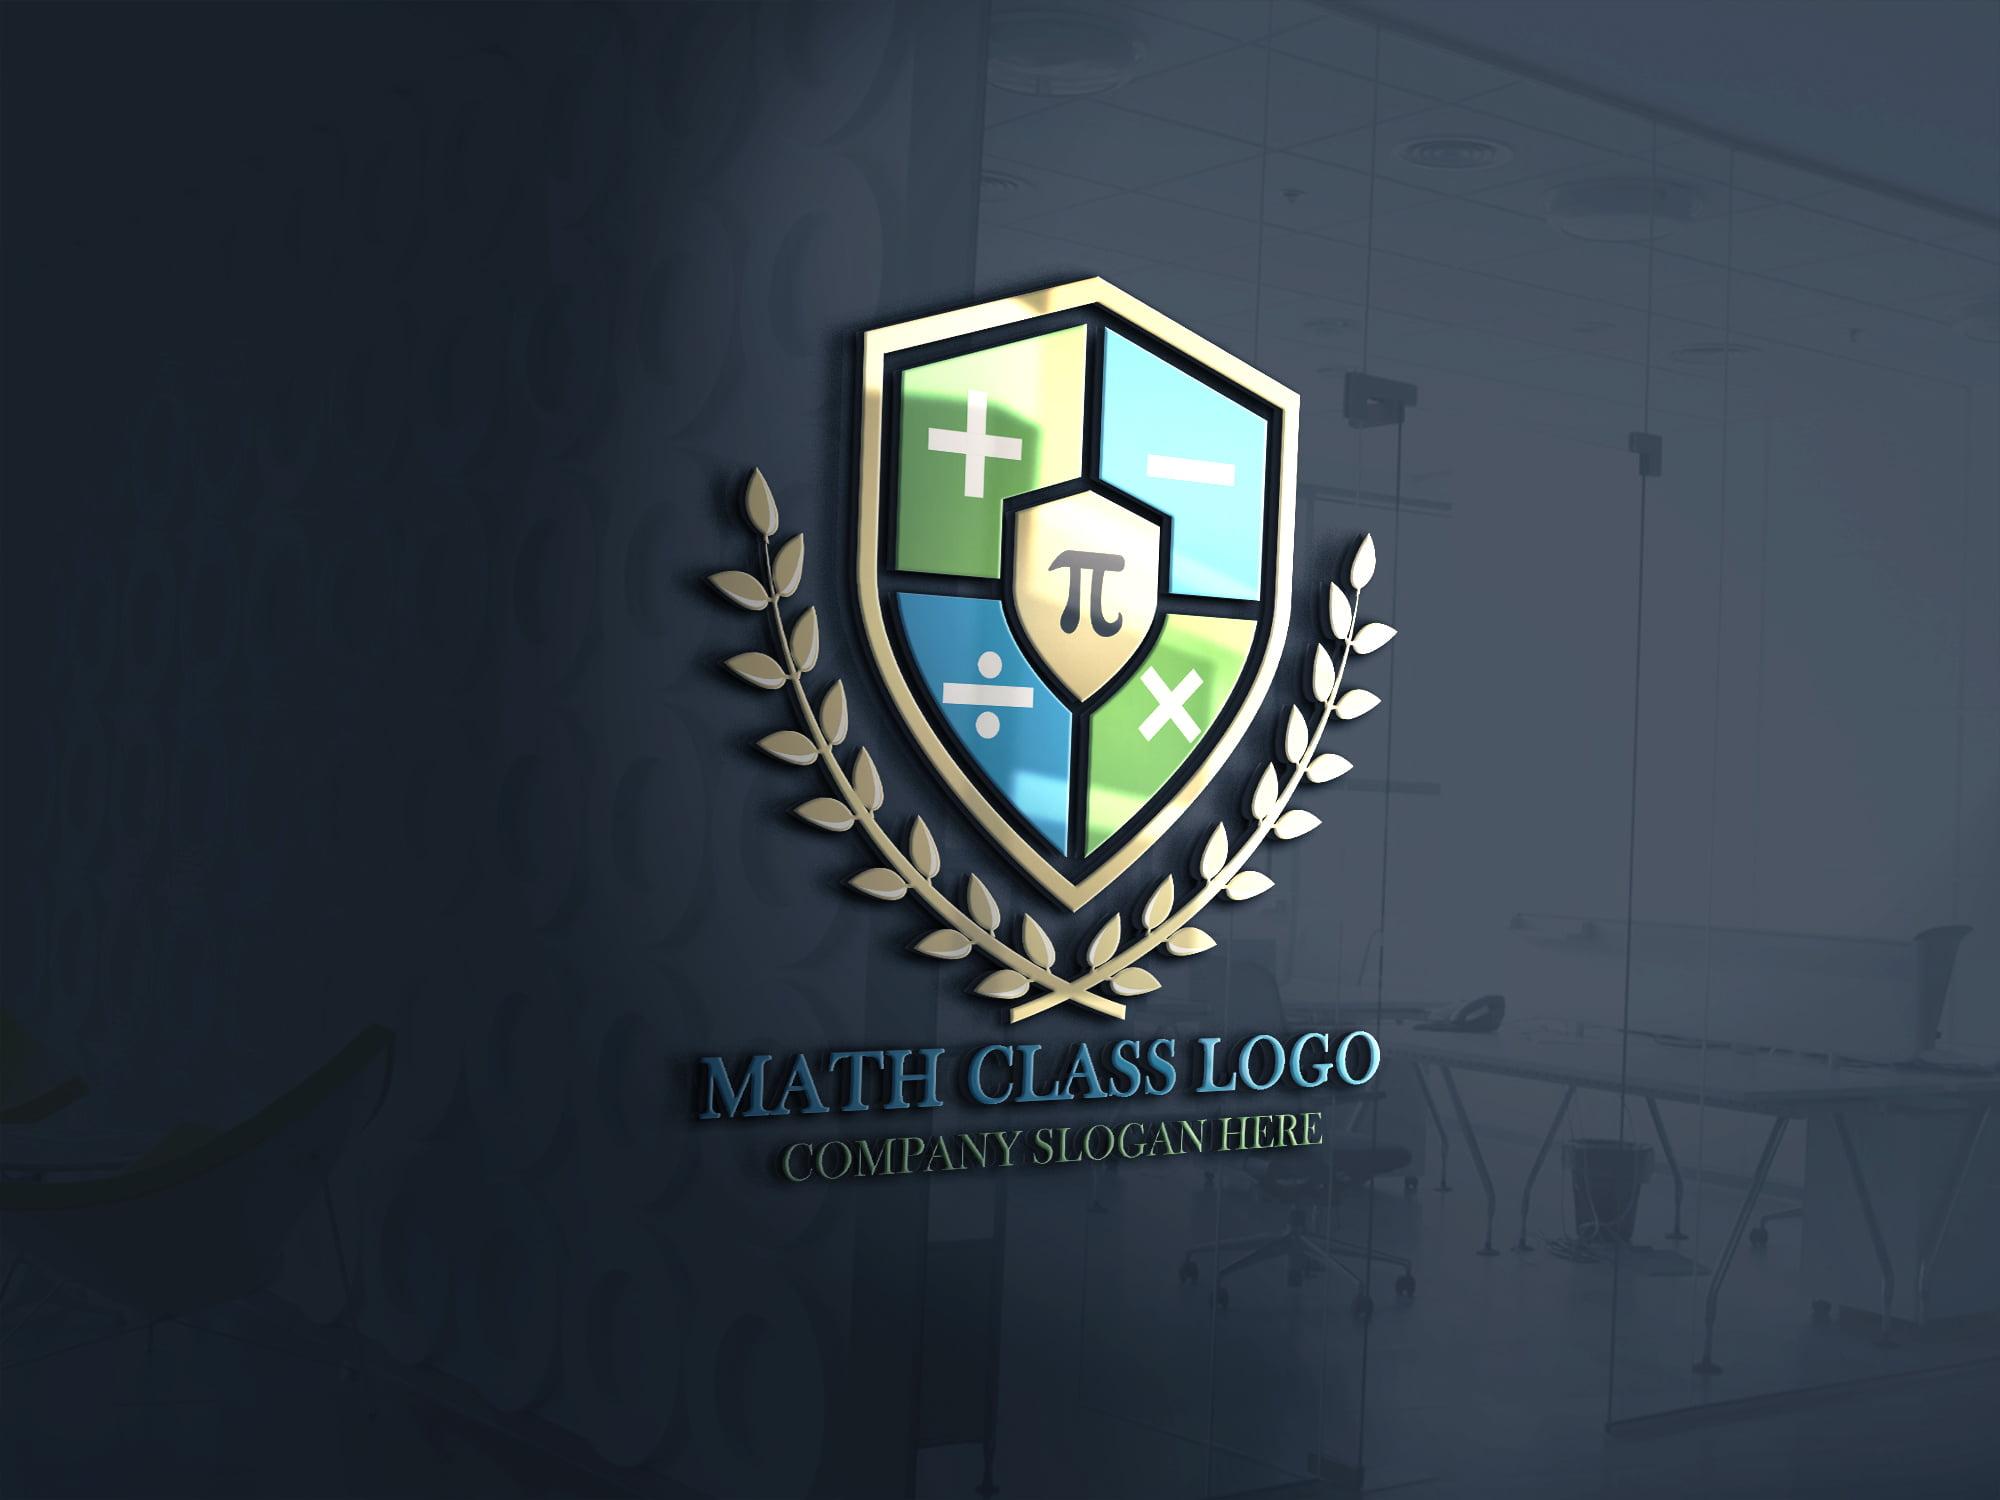 Math Tutorial logo on 3d Glass window